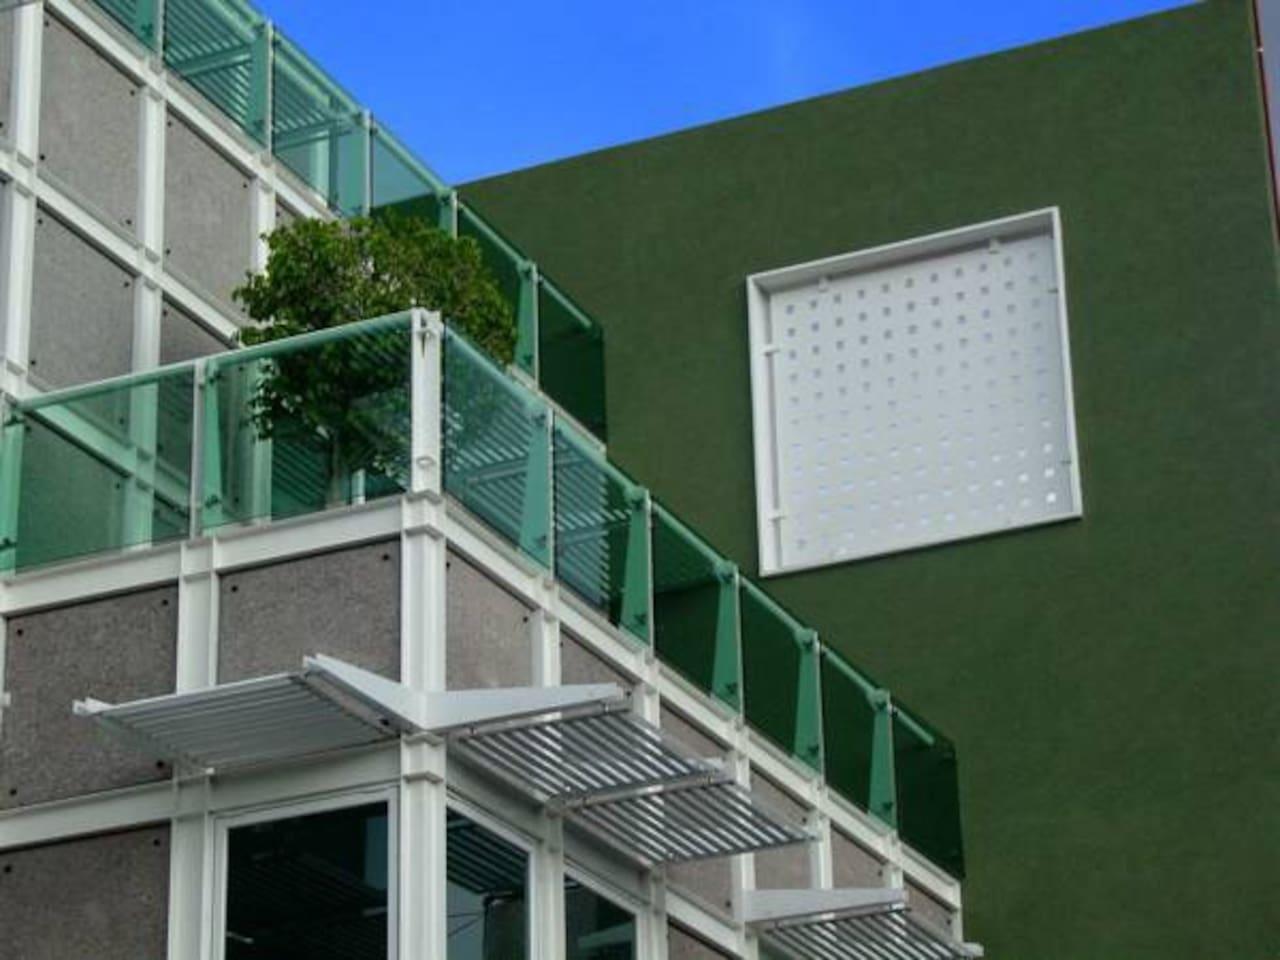 Kubo Suites Suite B De Lujo Apartments For Rent In San